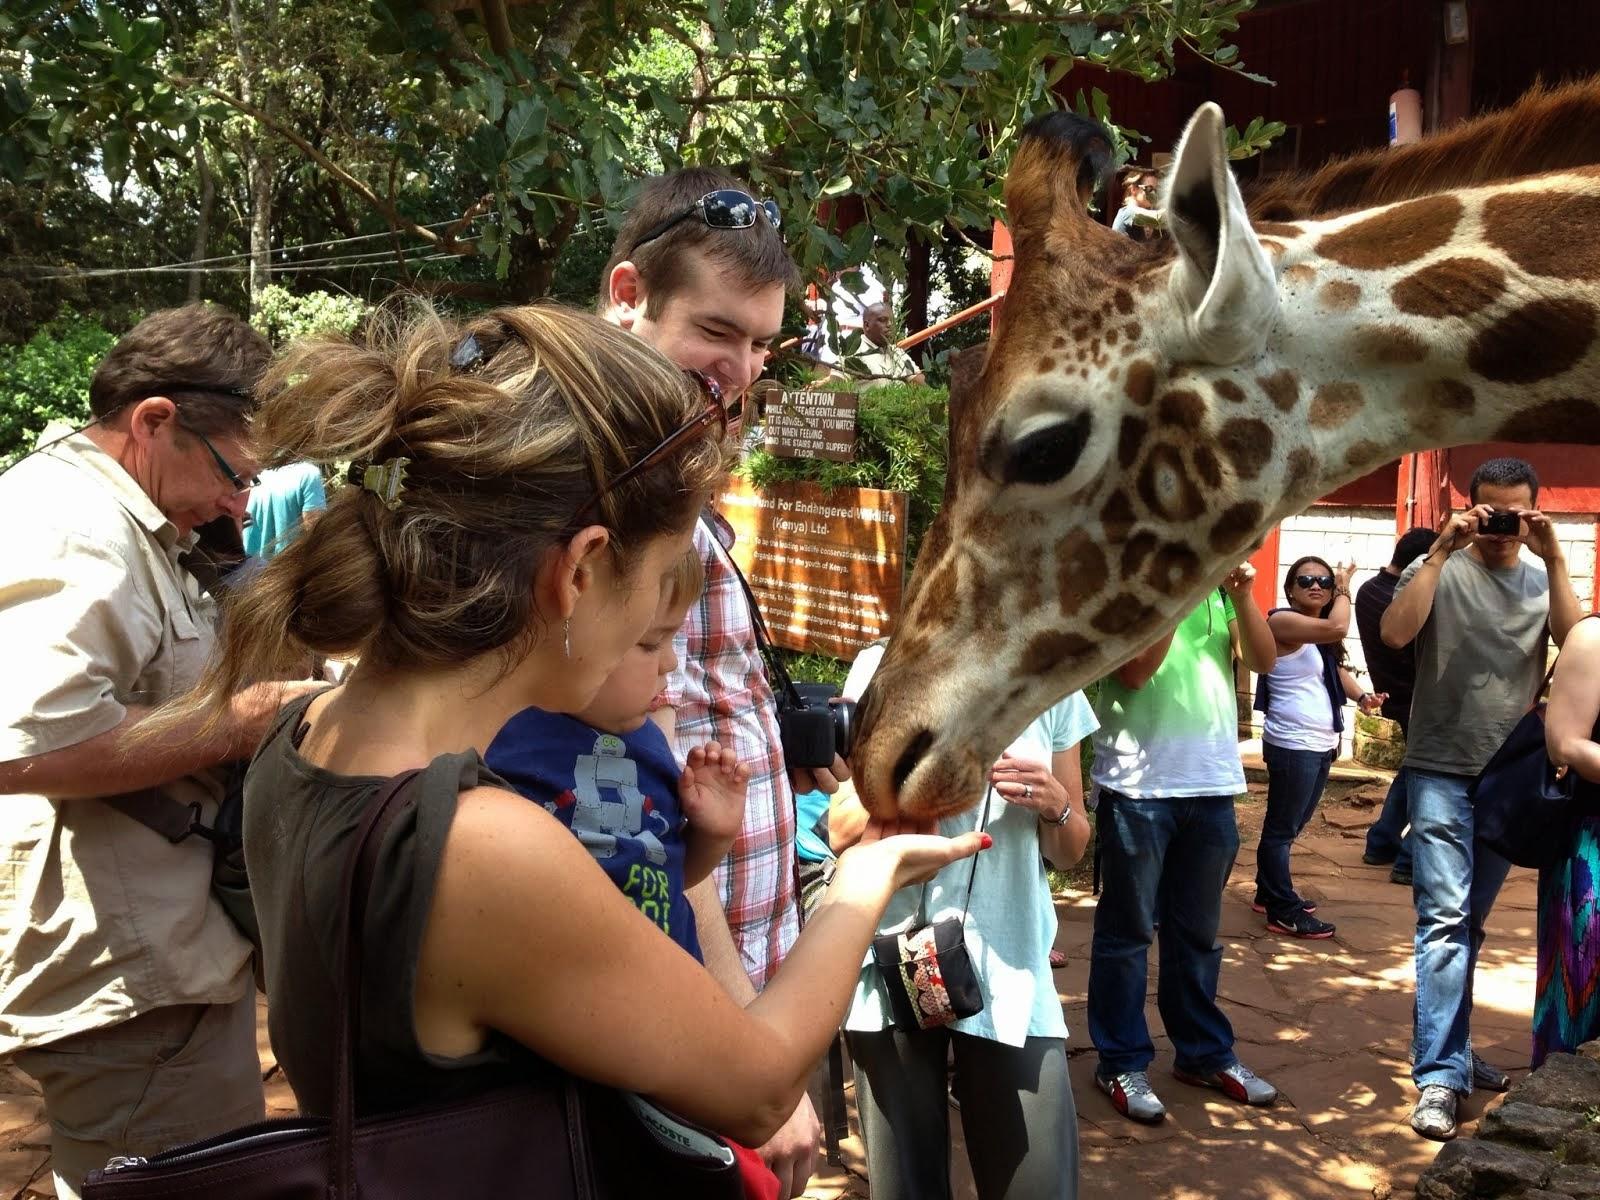 Visit to Giraffe Center